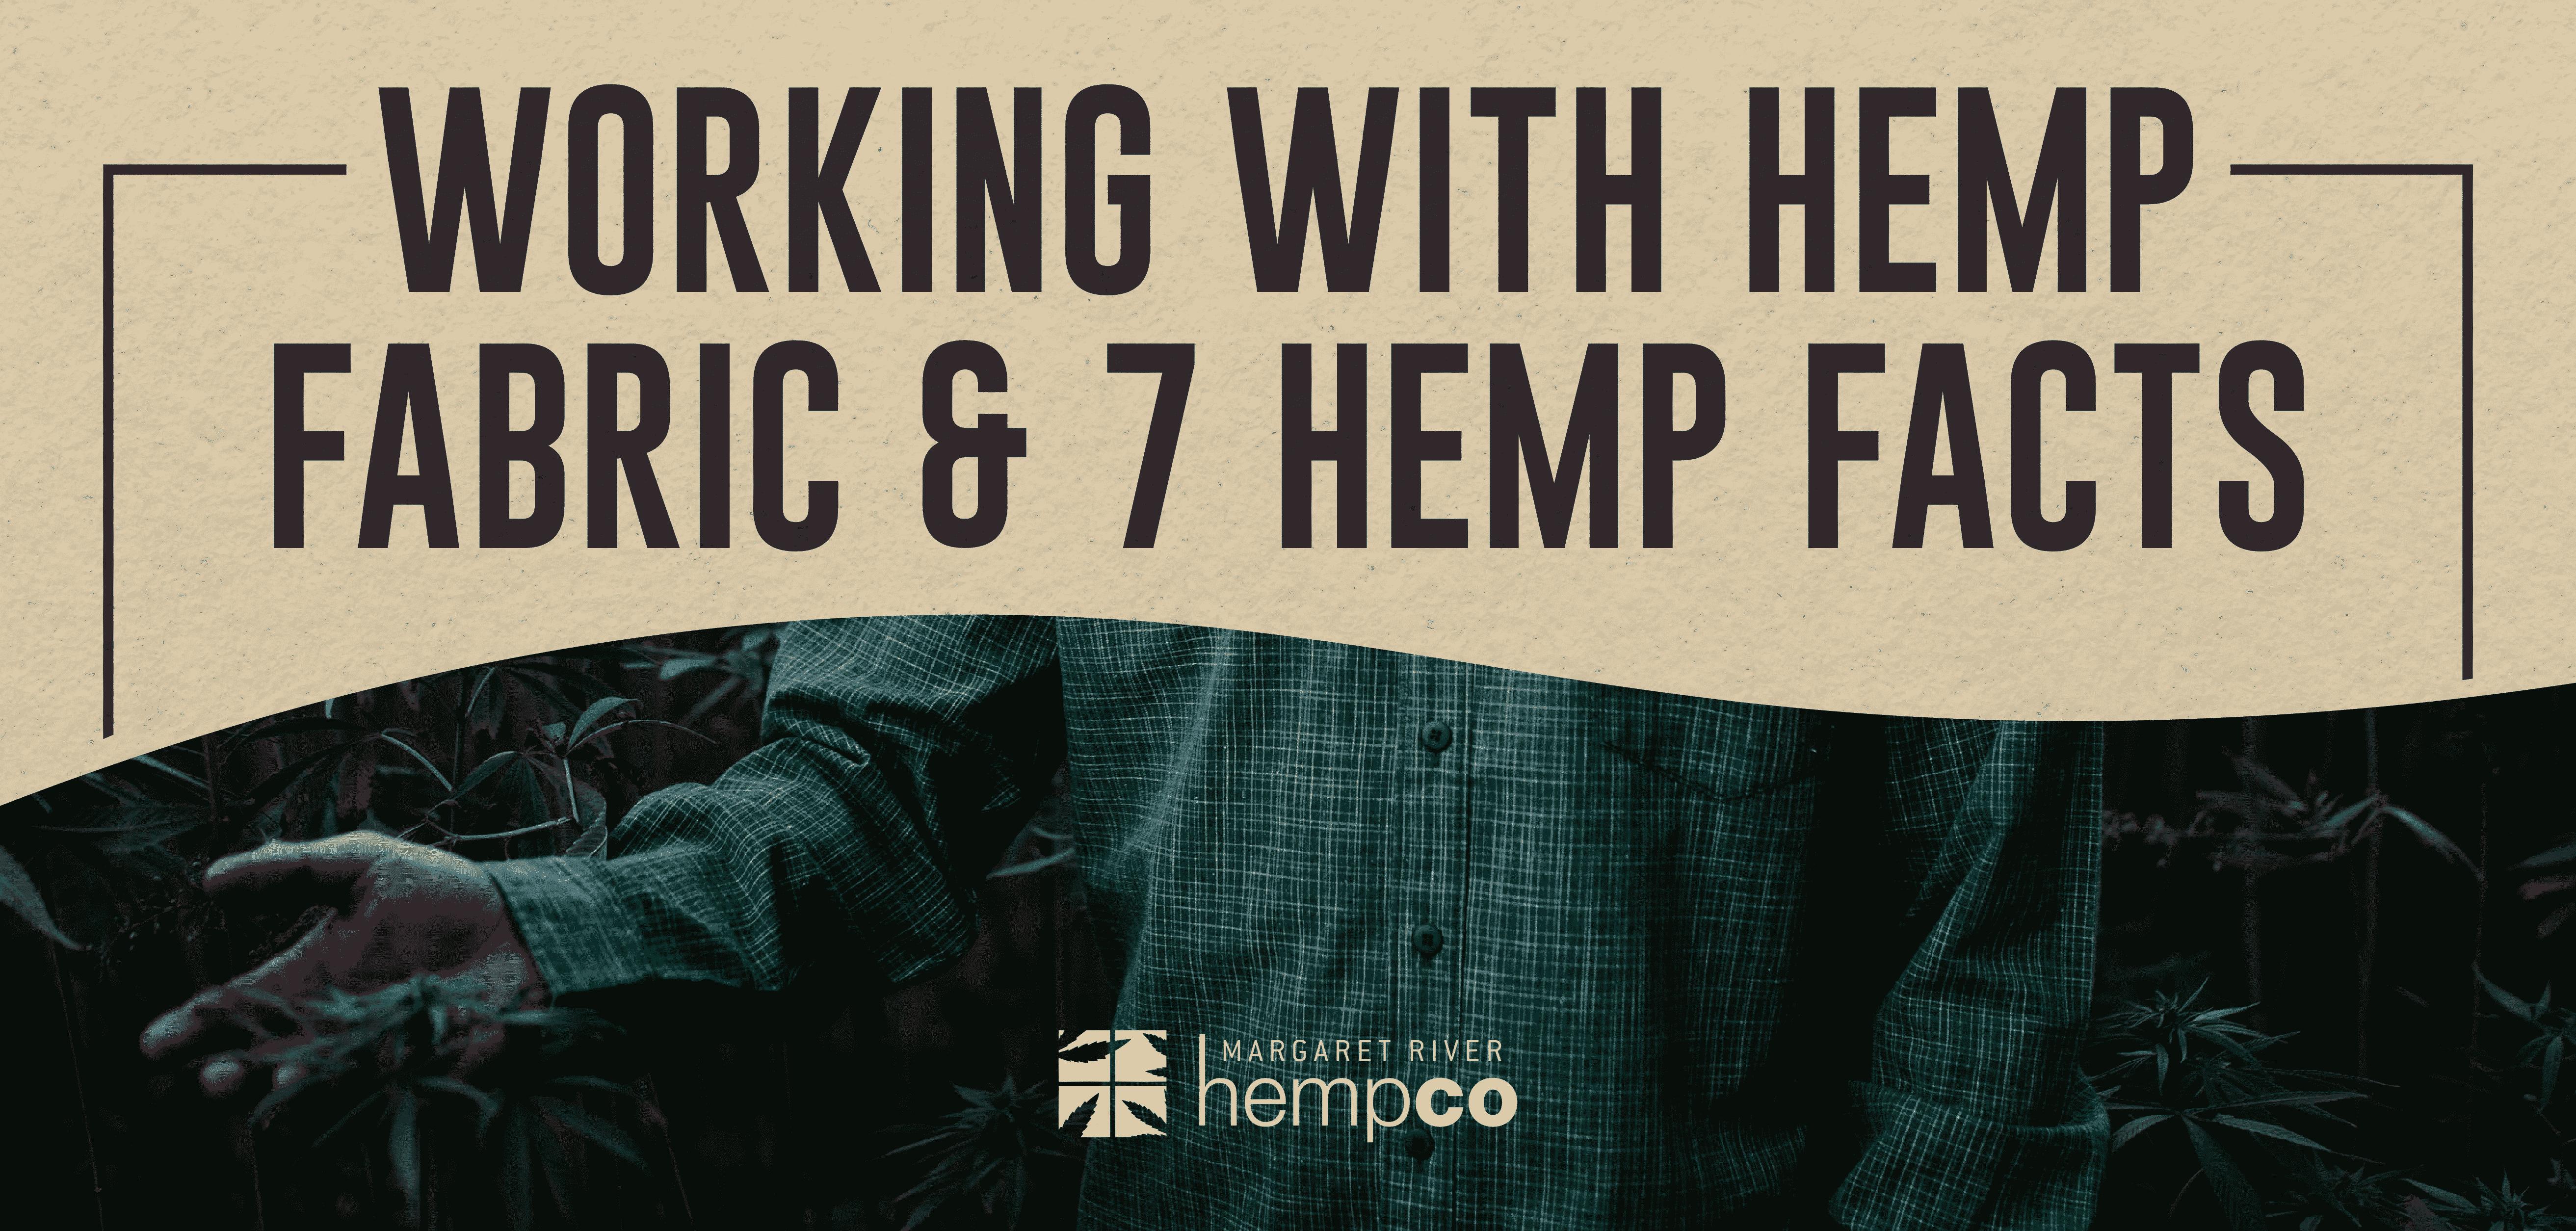 Working with Hemp Fabric